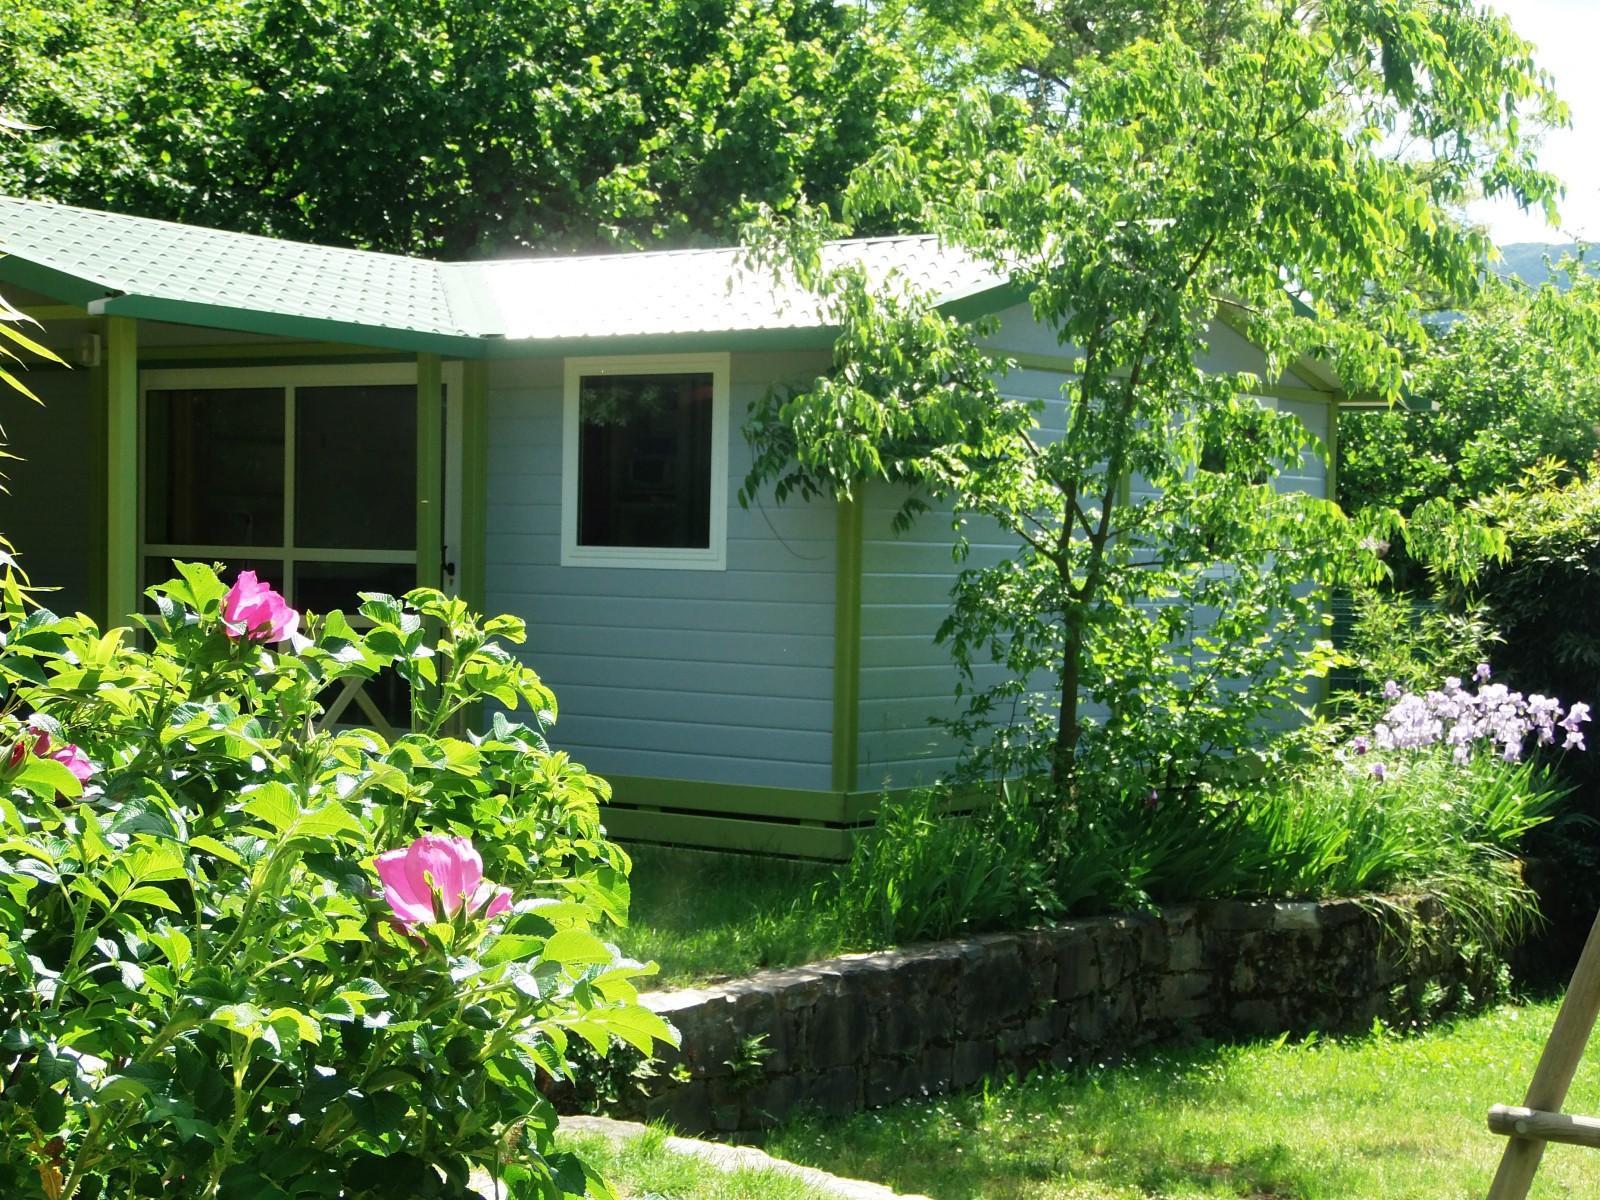 Cévennes camping rentals in Saint Jean du Gard